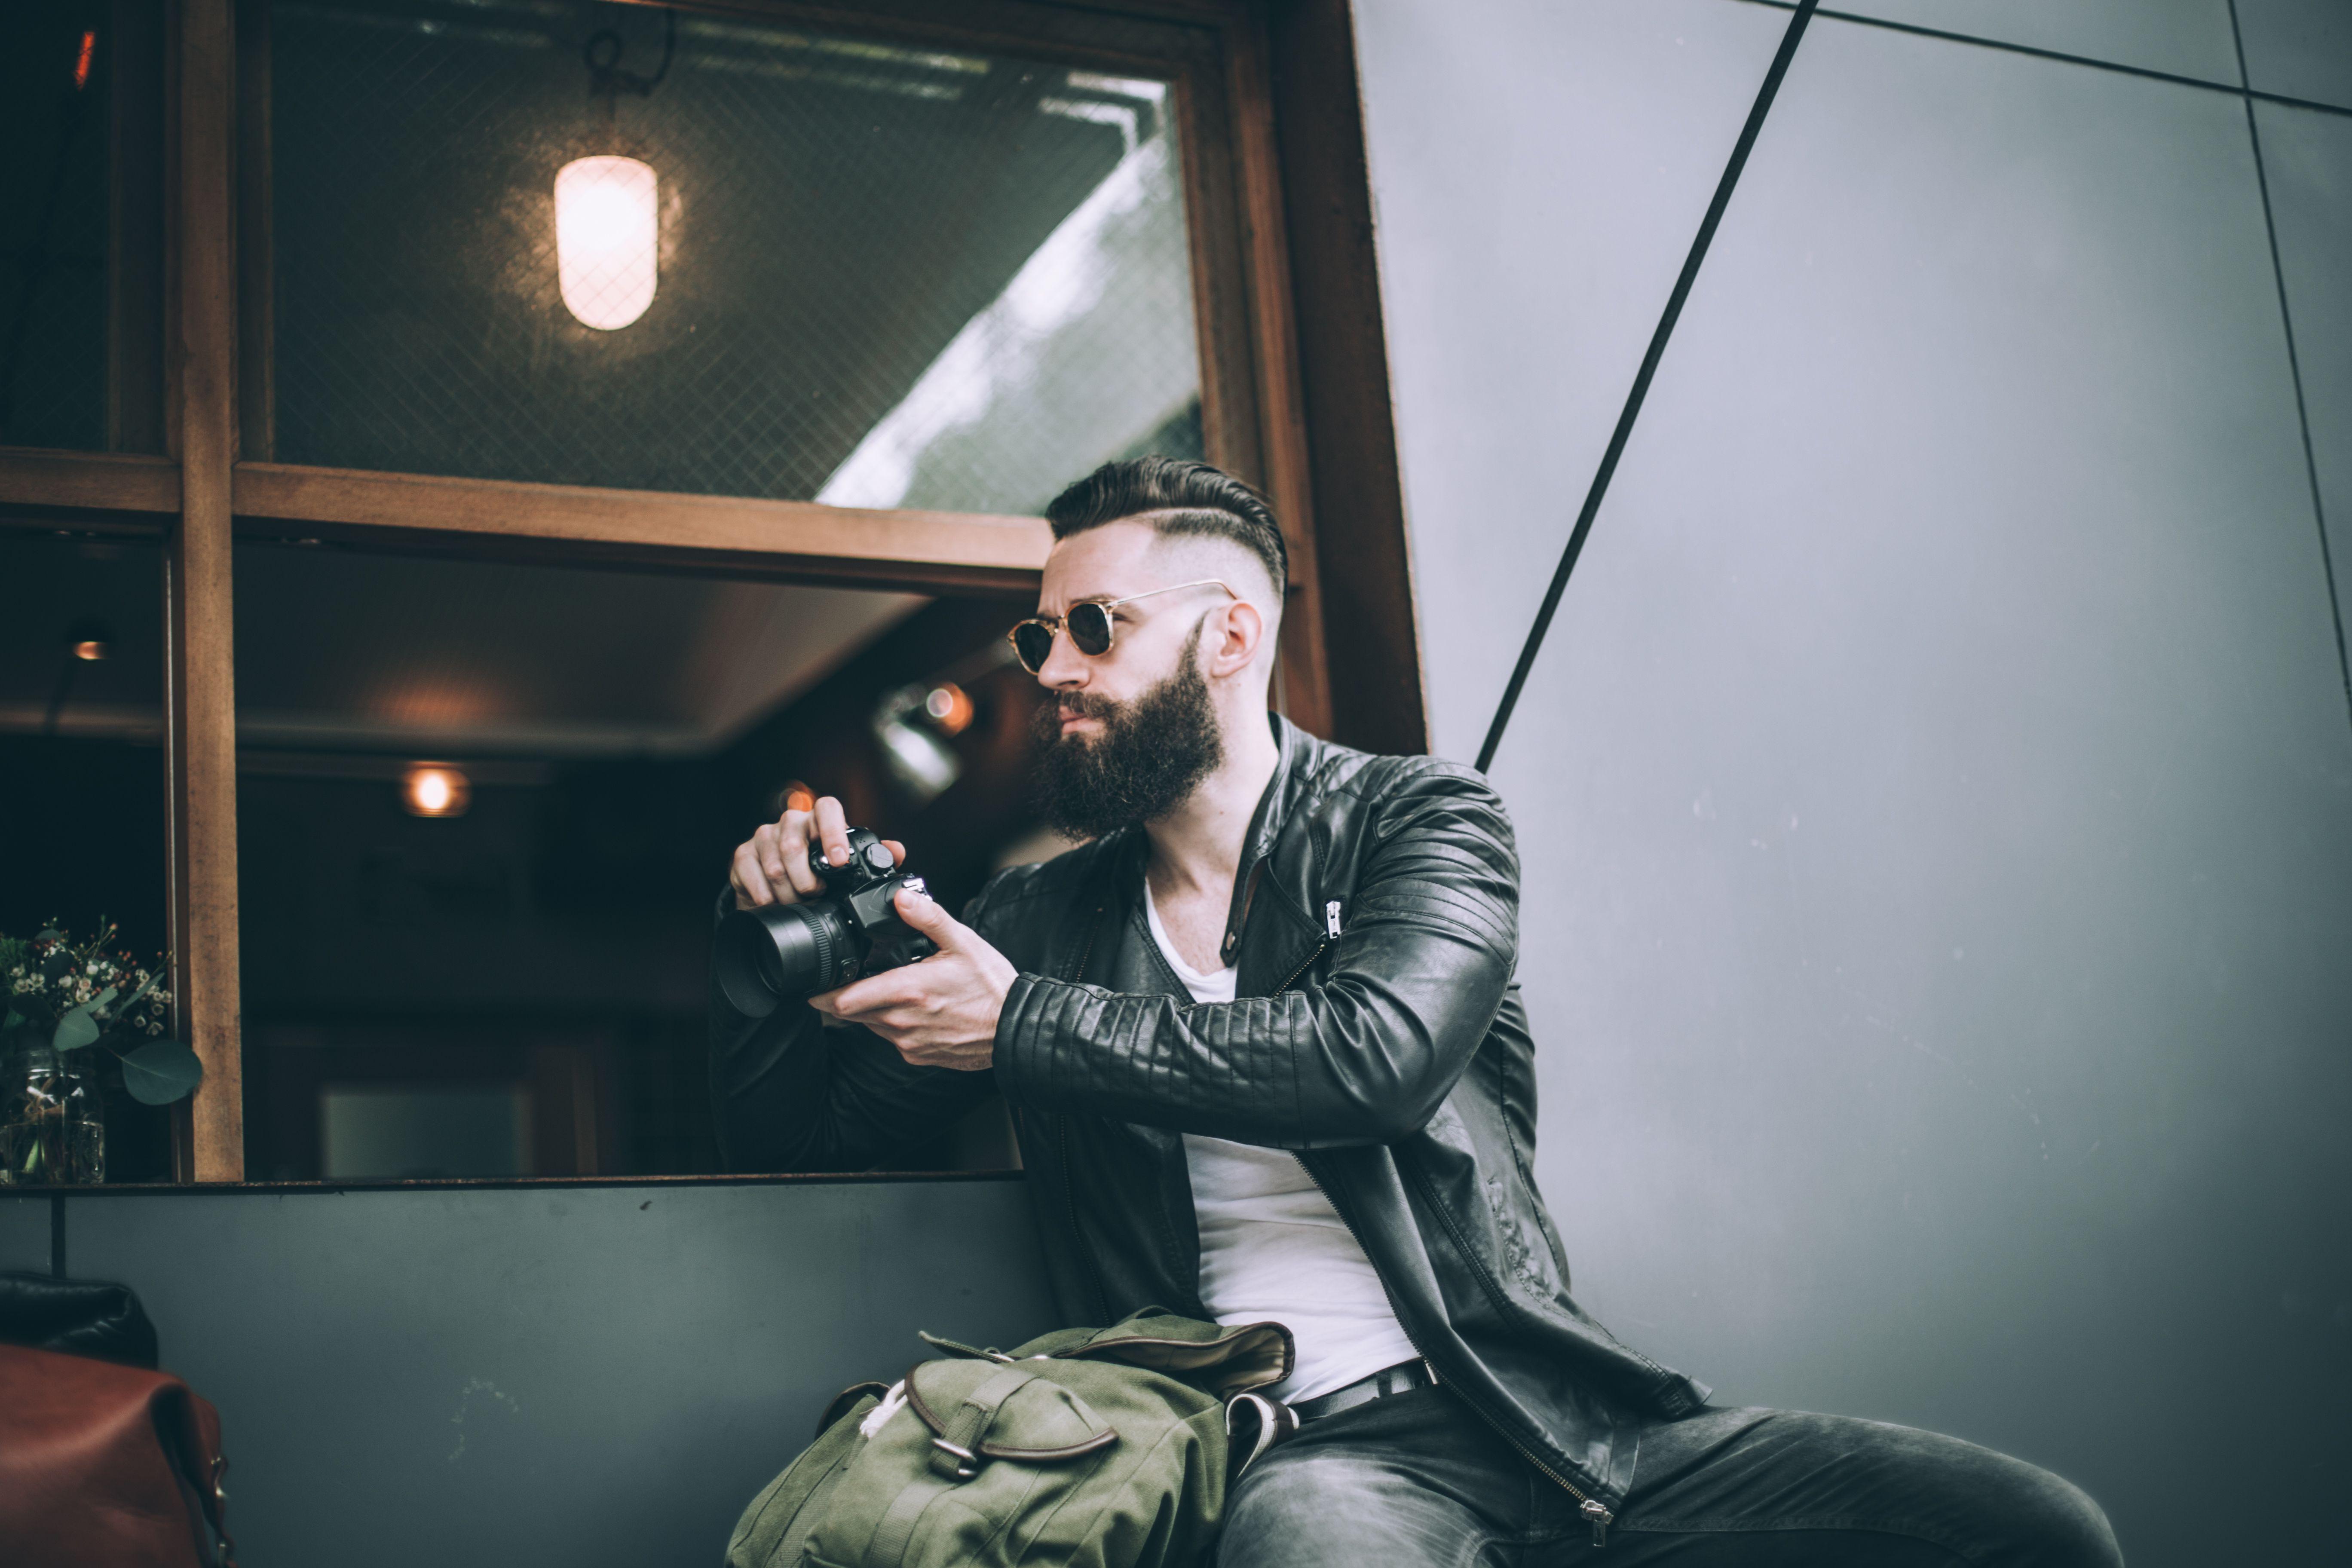 Man wearing sunglasses and leather jacket, holding camera